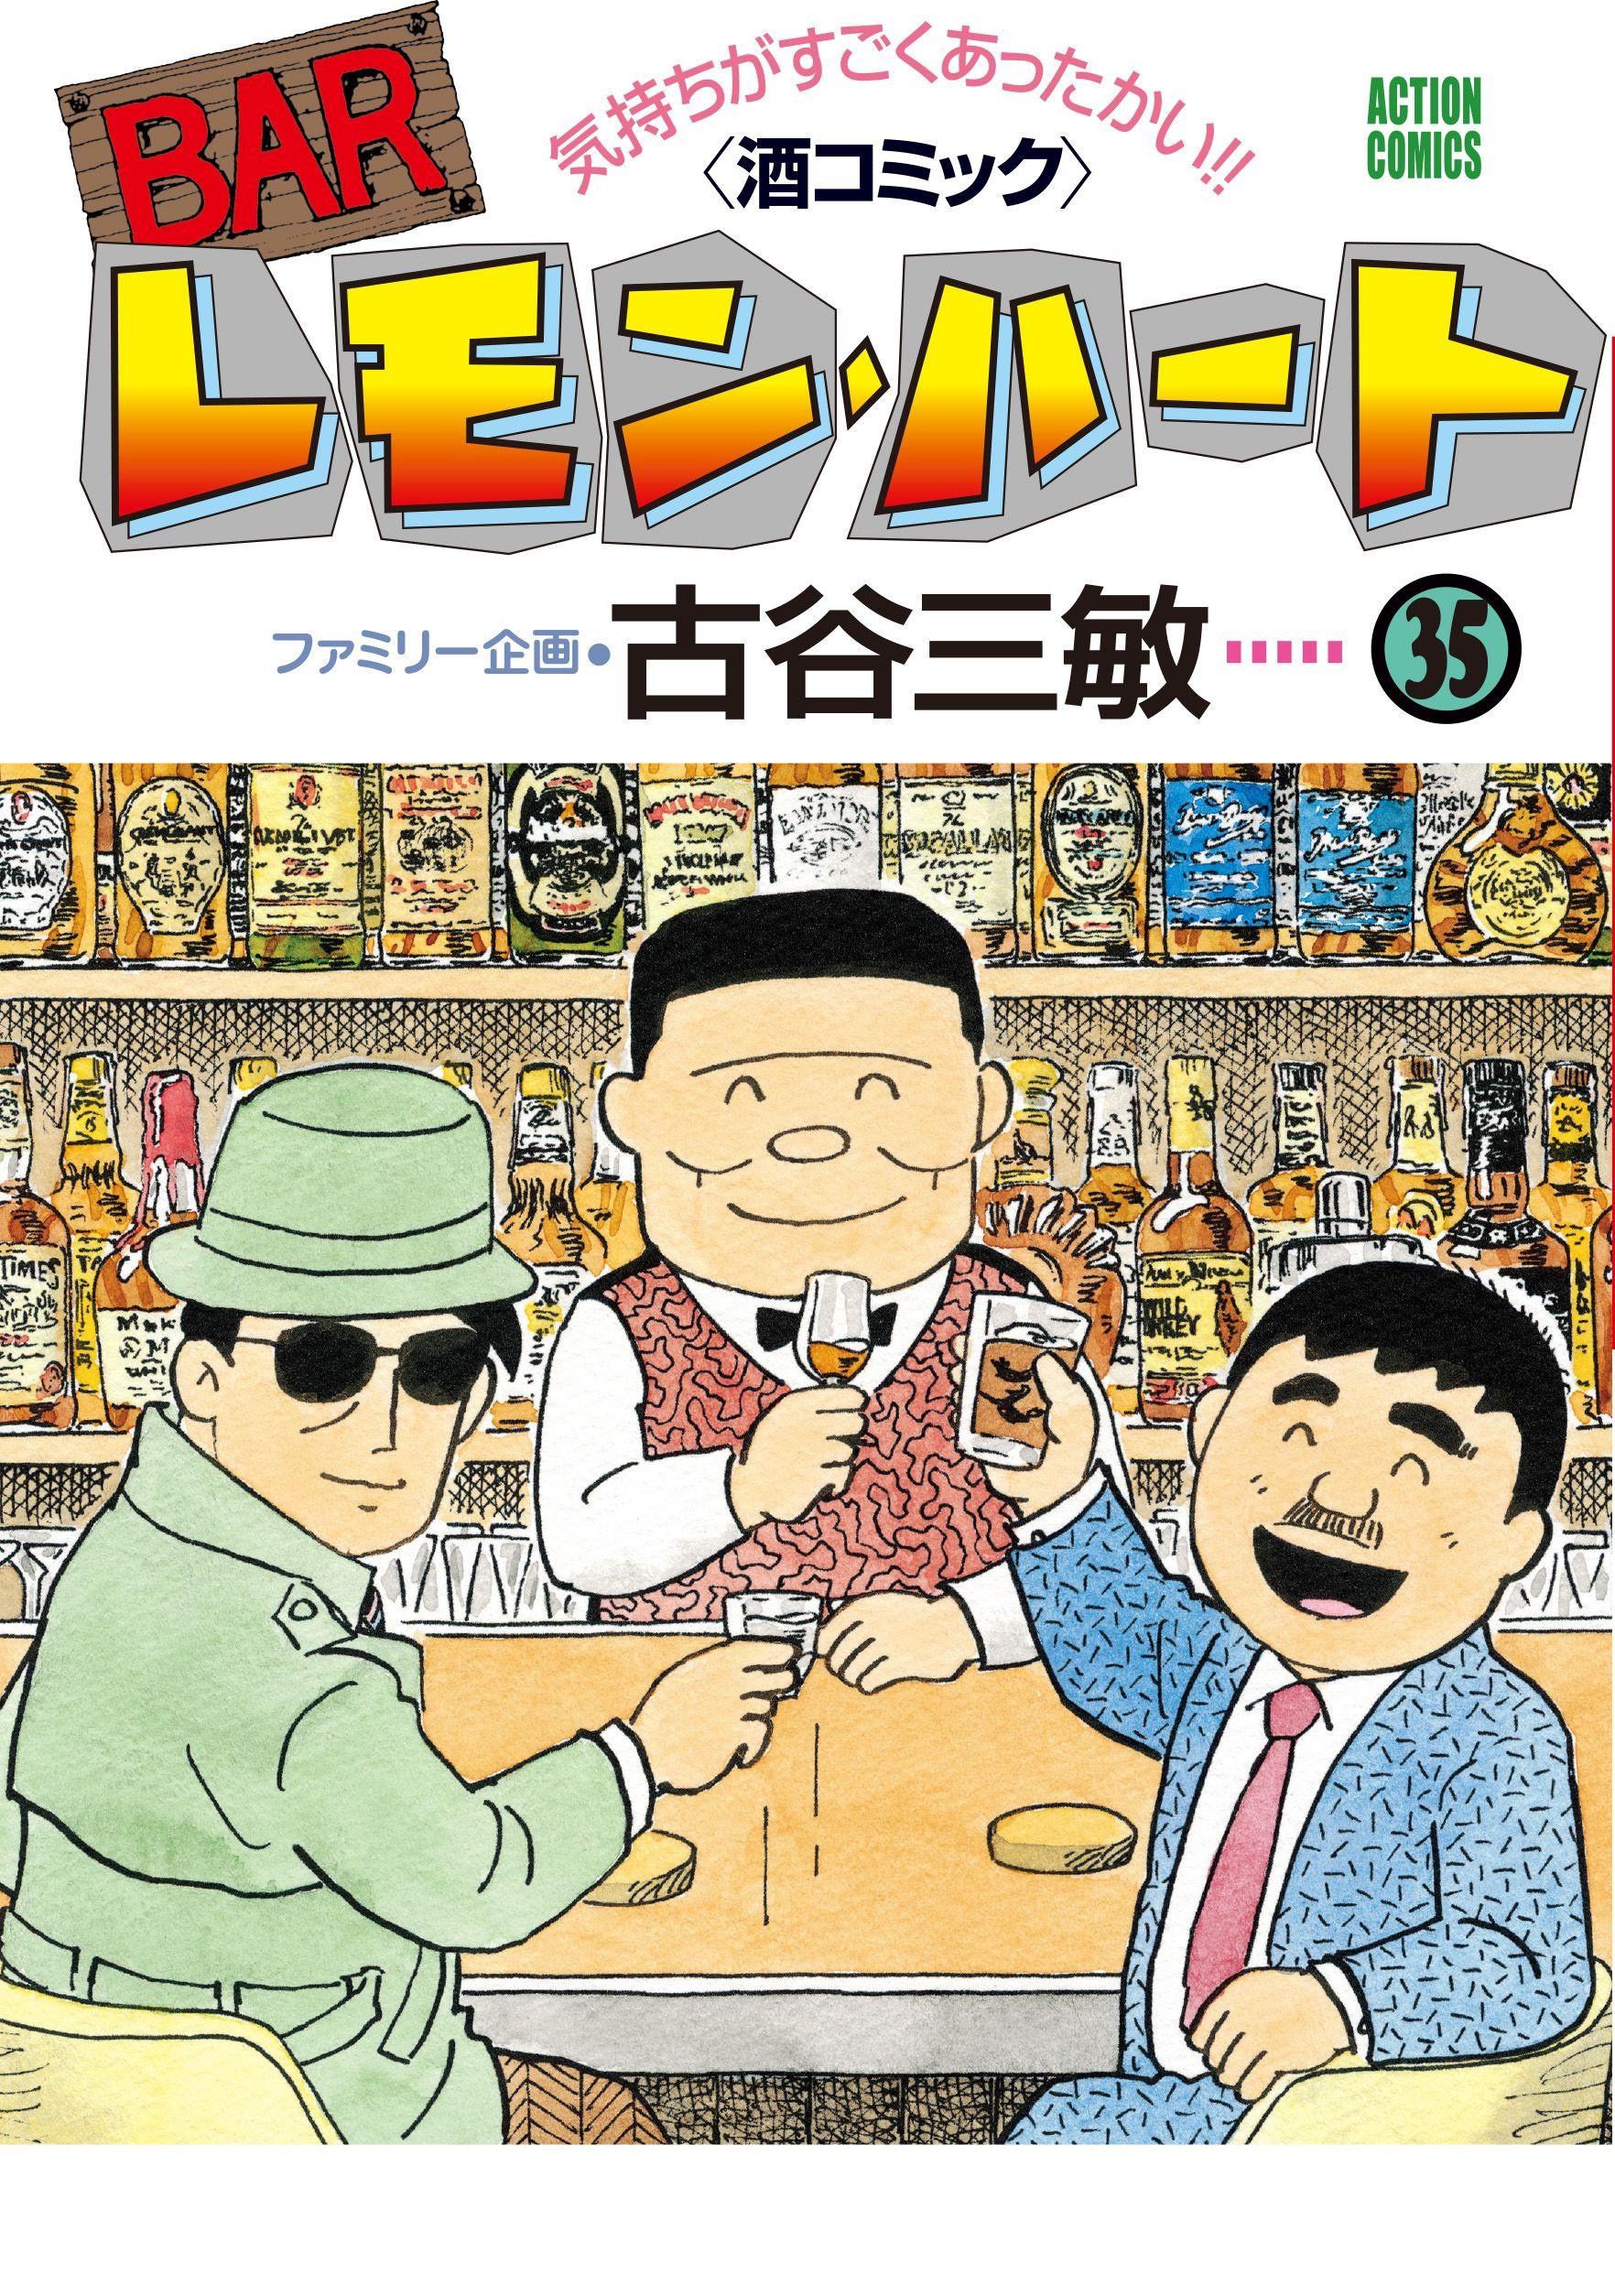 『BARレモン・ハート 35巻』の漫画を全巻無料で読む方法は?